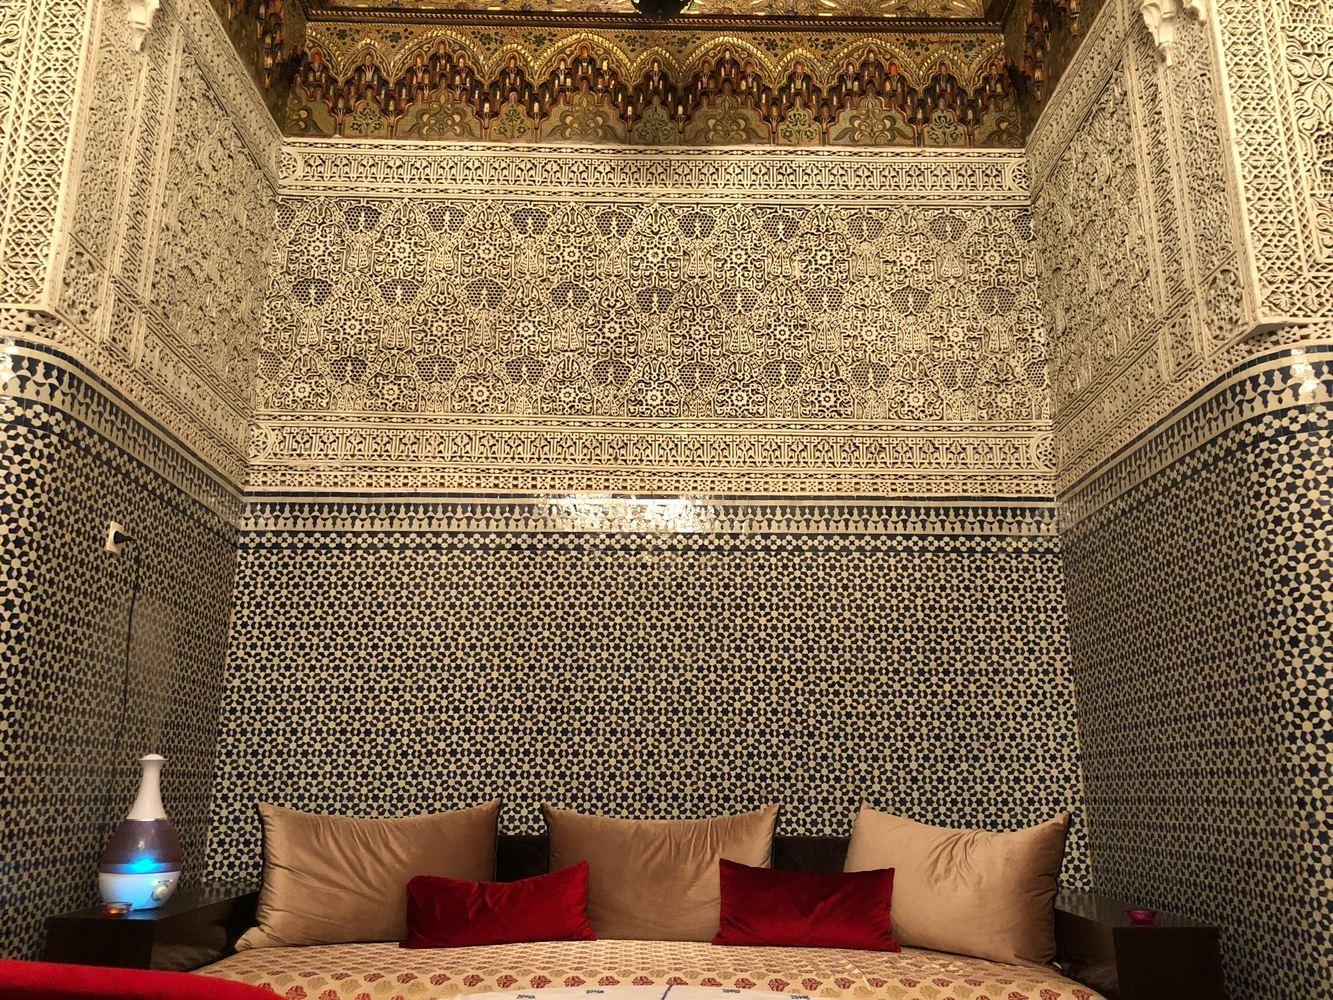 Escape to Casablanca and the Sahara Tour March 30 - April 8